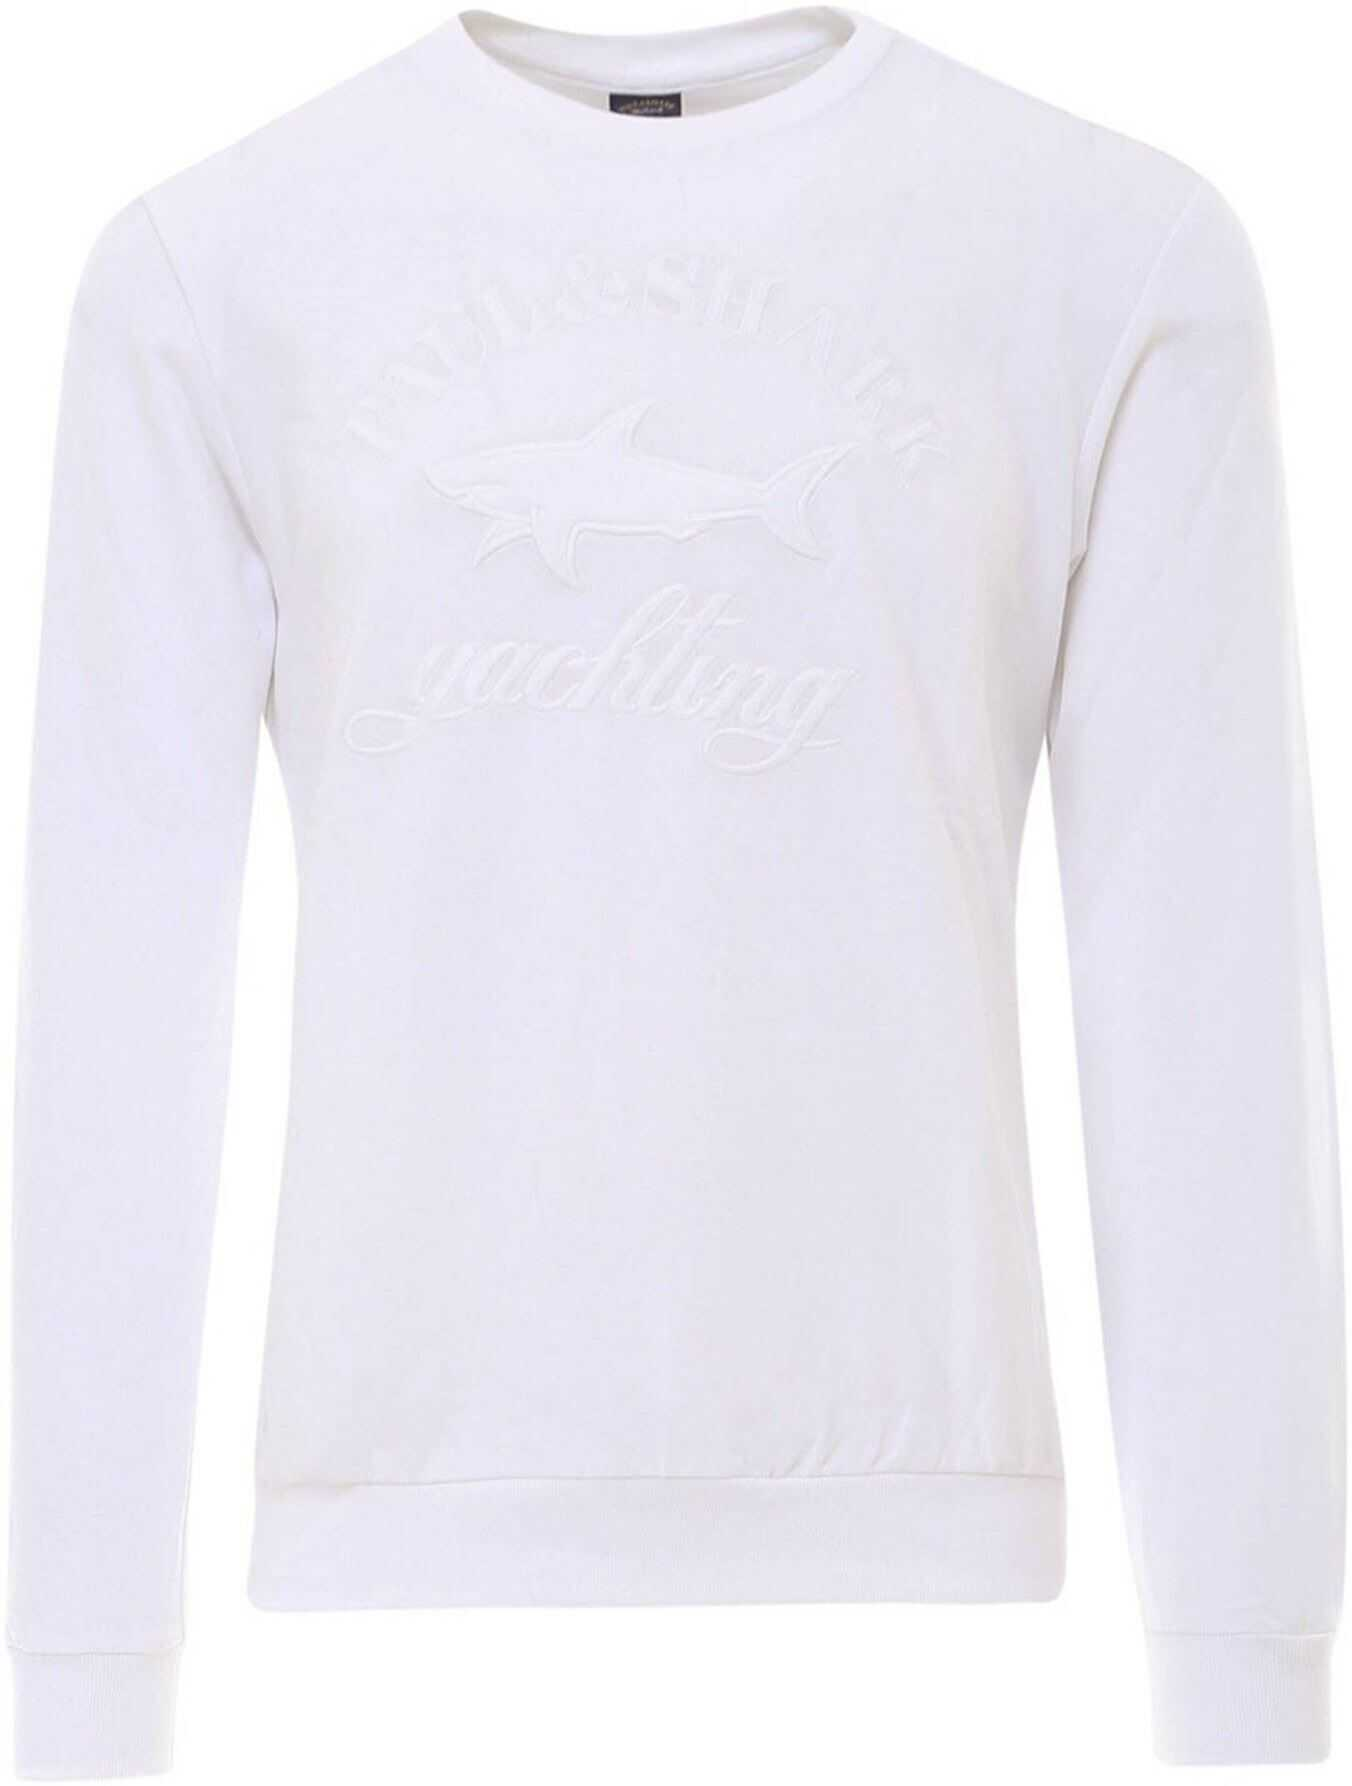 Paul&Shark Embroidered Cotton Sweatshirt In White White imagine